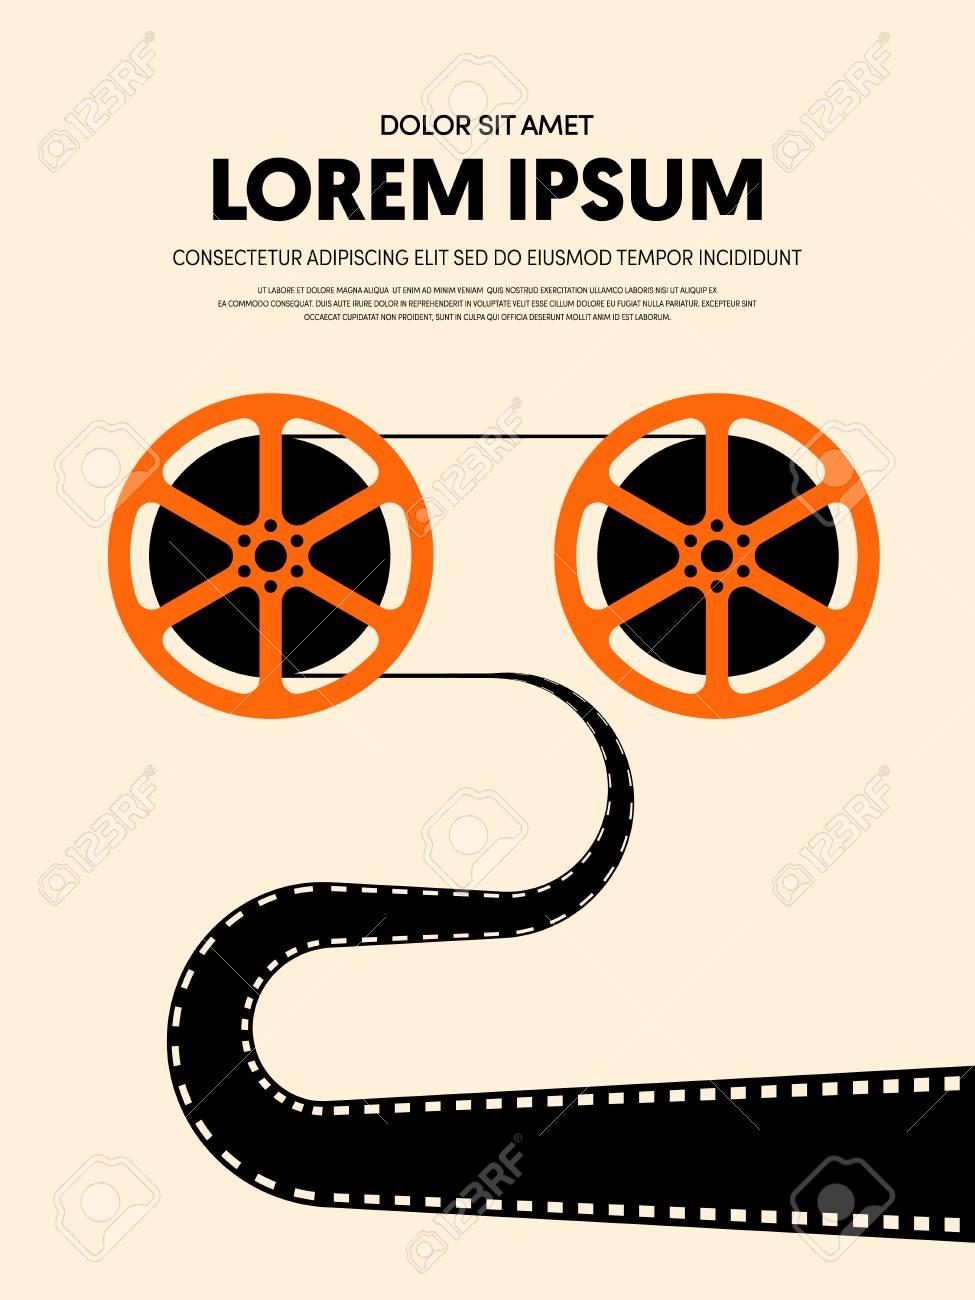 Movie And Film Modern Retro Vintage Poster Background Design